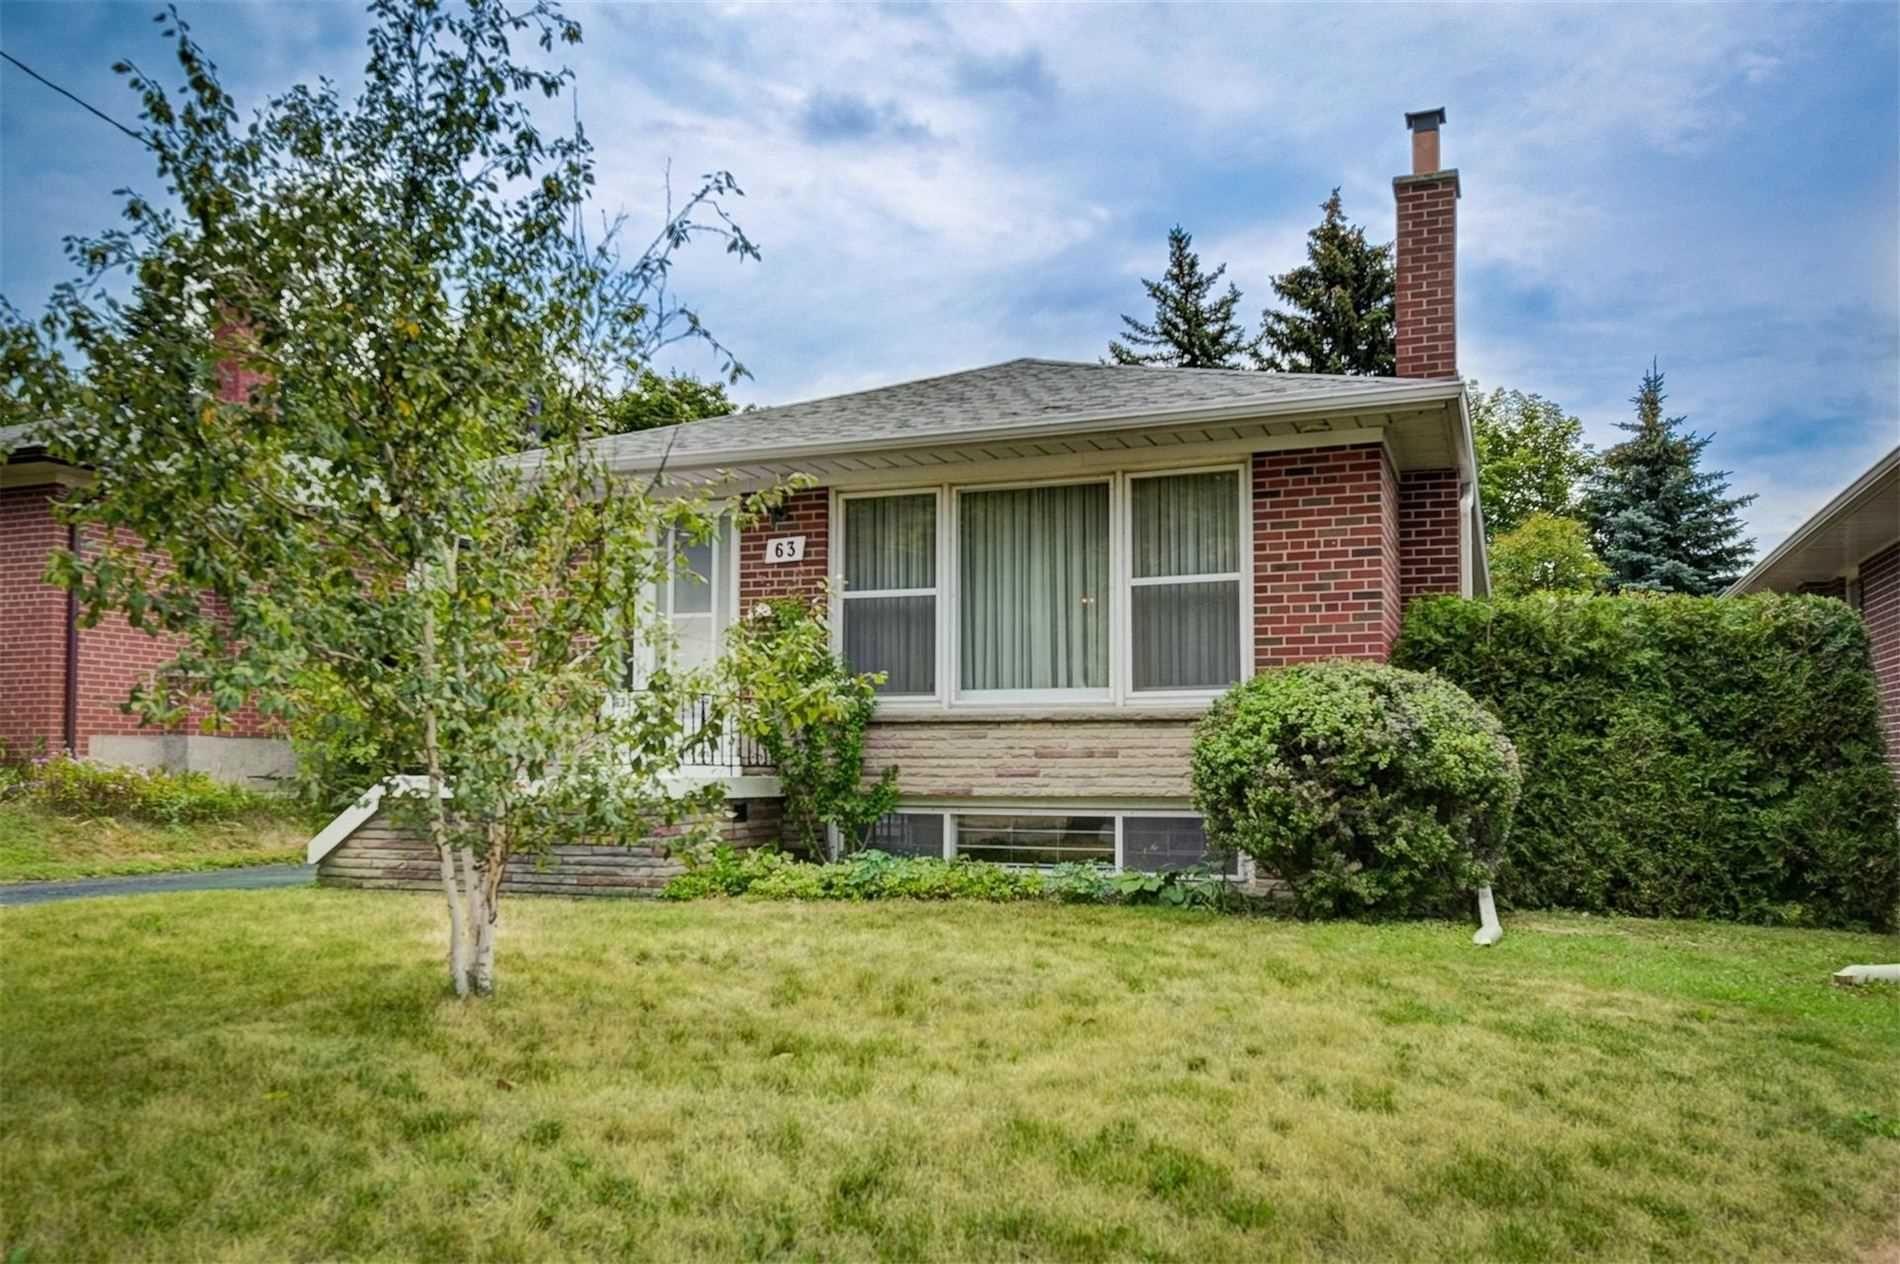 Main Photo: 63 Pandora Circle in Toronto: Woburn House (Bungalow) for sale (Toronto E09)  : MLS®# E4842972